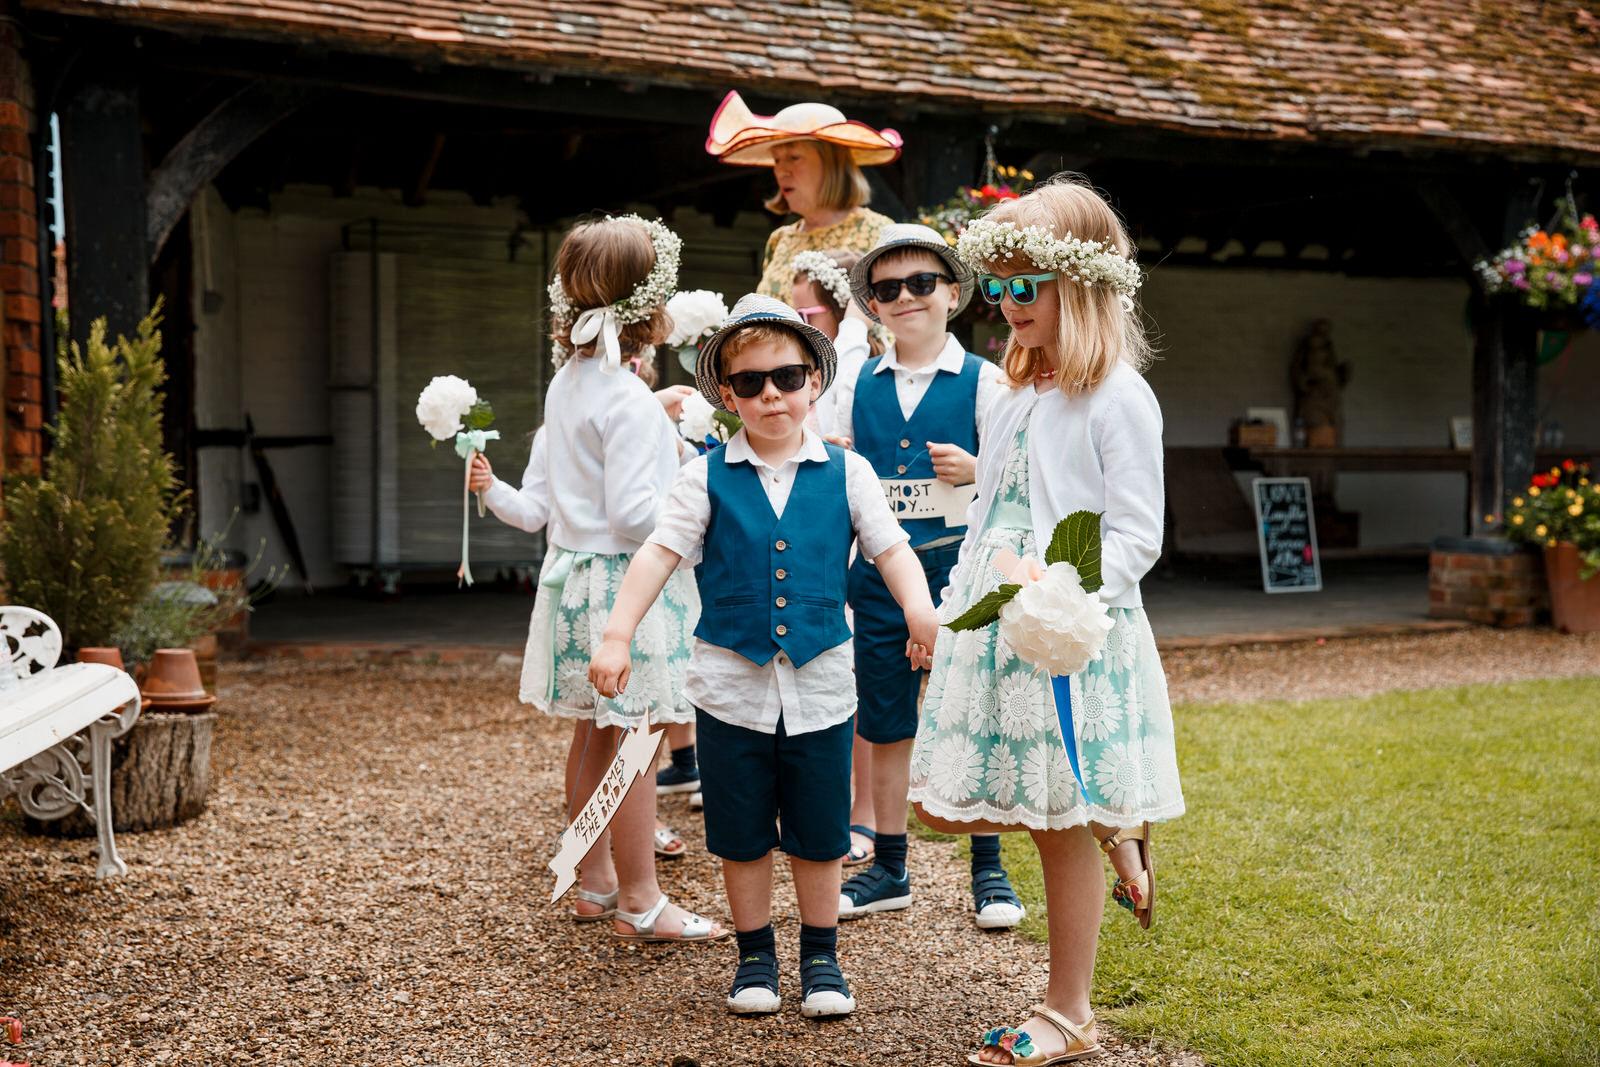 Home counties wedding photography by Damion Mower on English-Wedding.com (18)